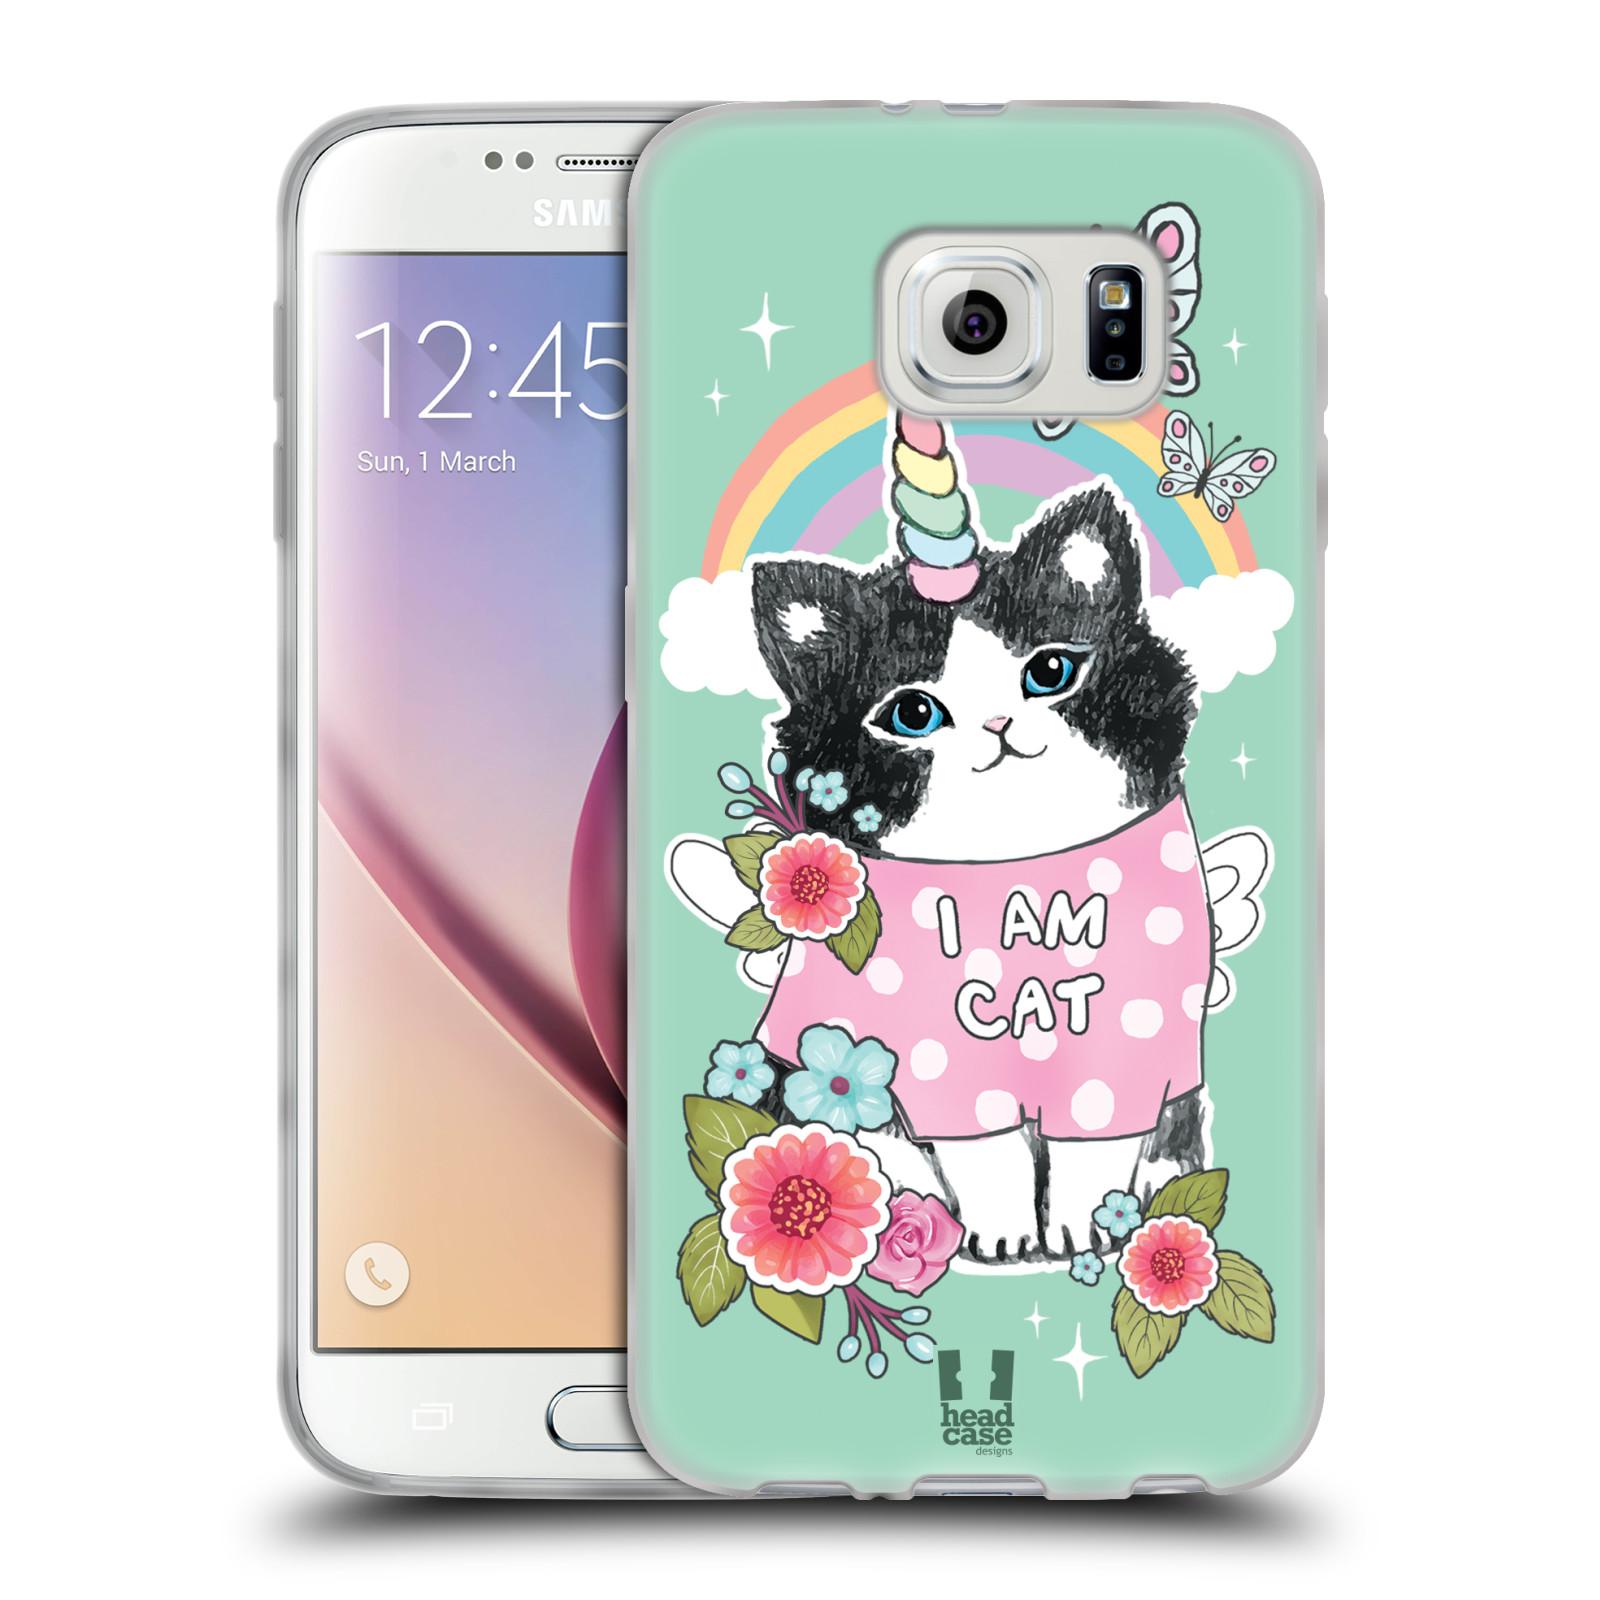 HEAD CASE DESIGNS WHIMSICAL KITTENS SOFT GEL CASE FOR SAMSUNG PHONES 1